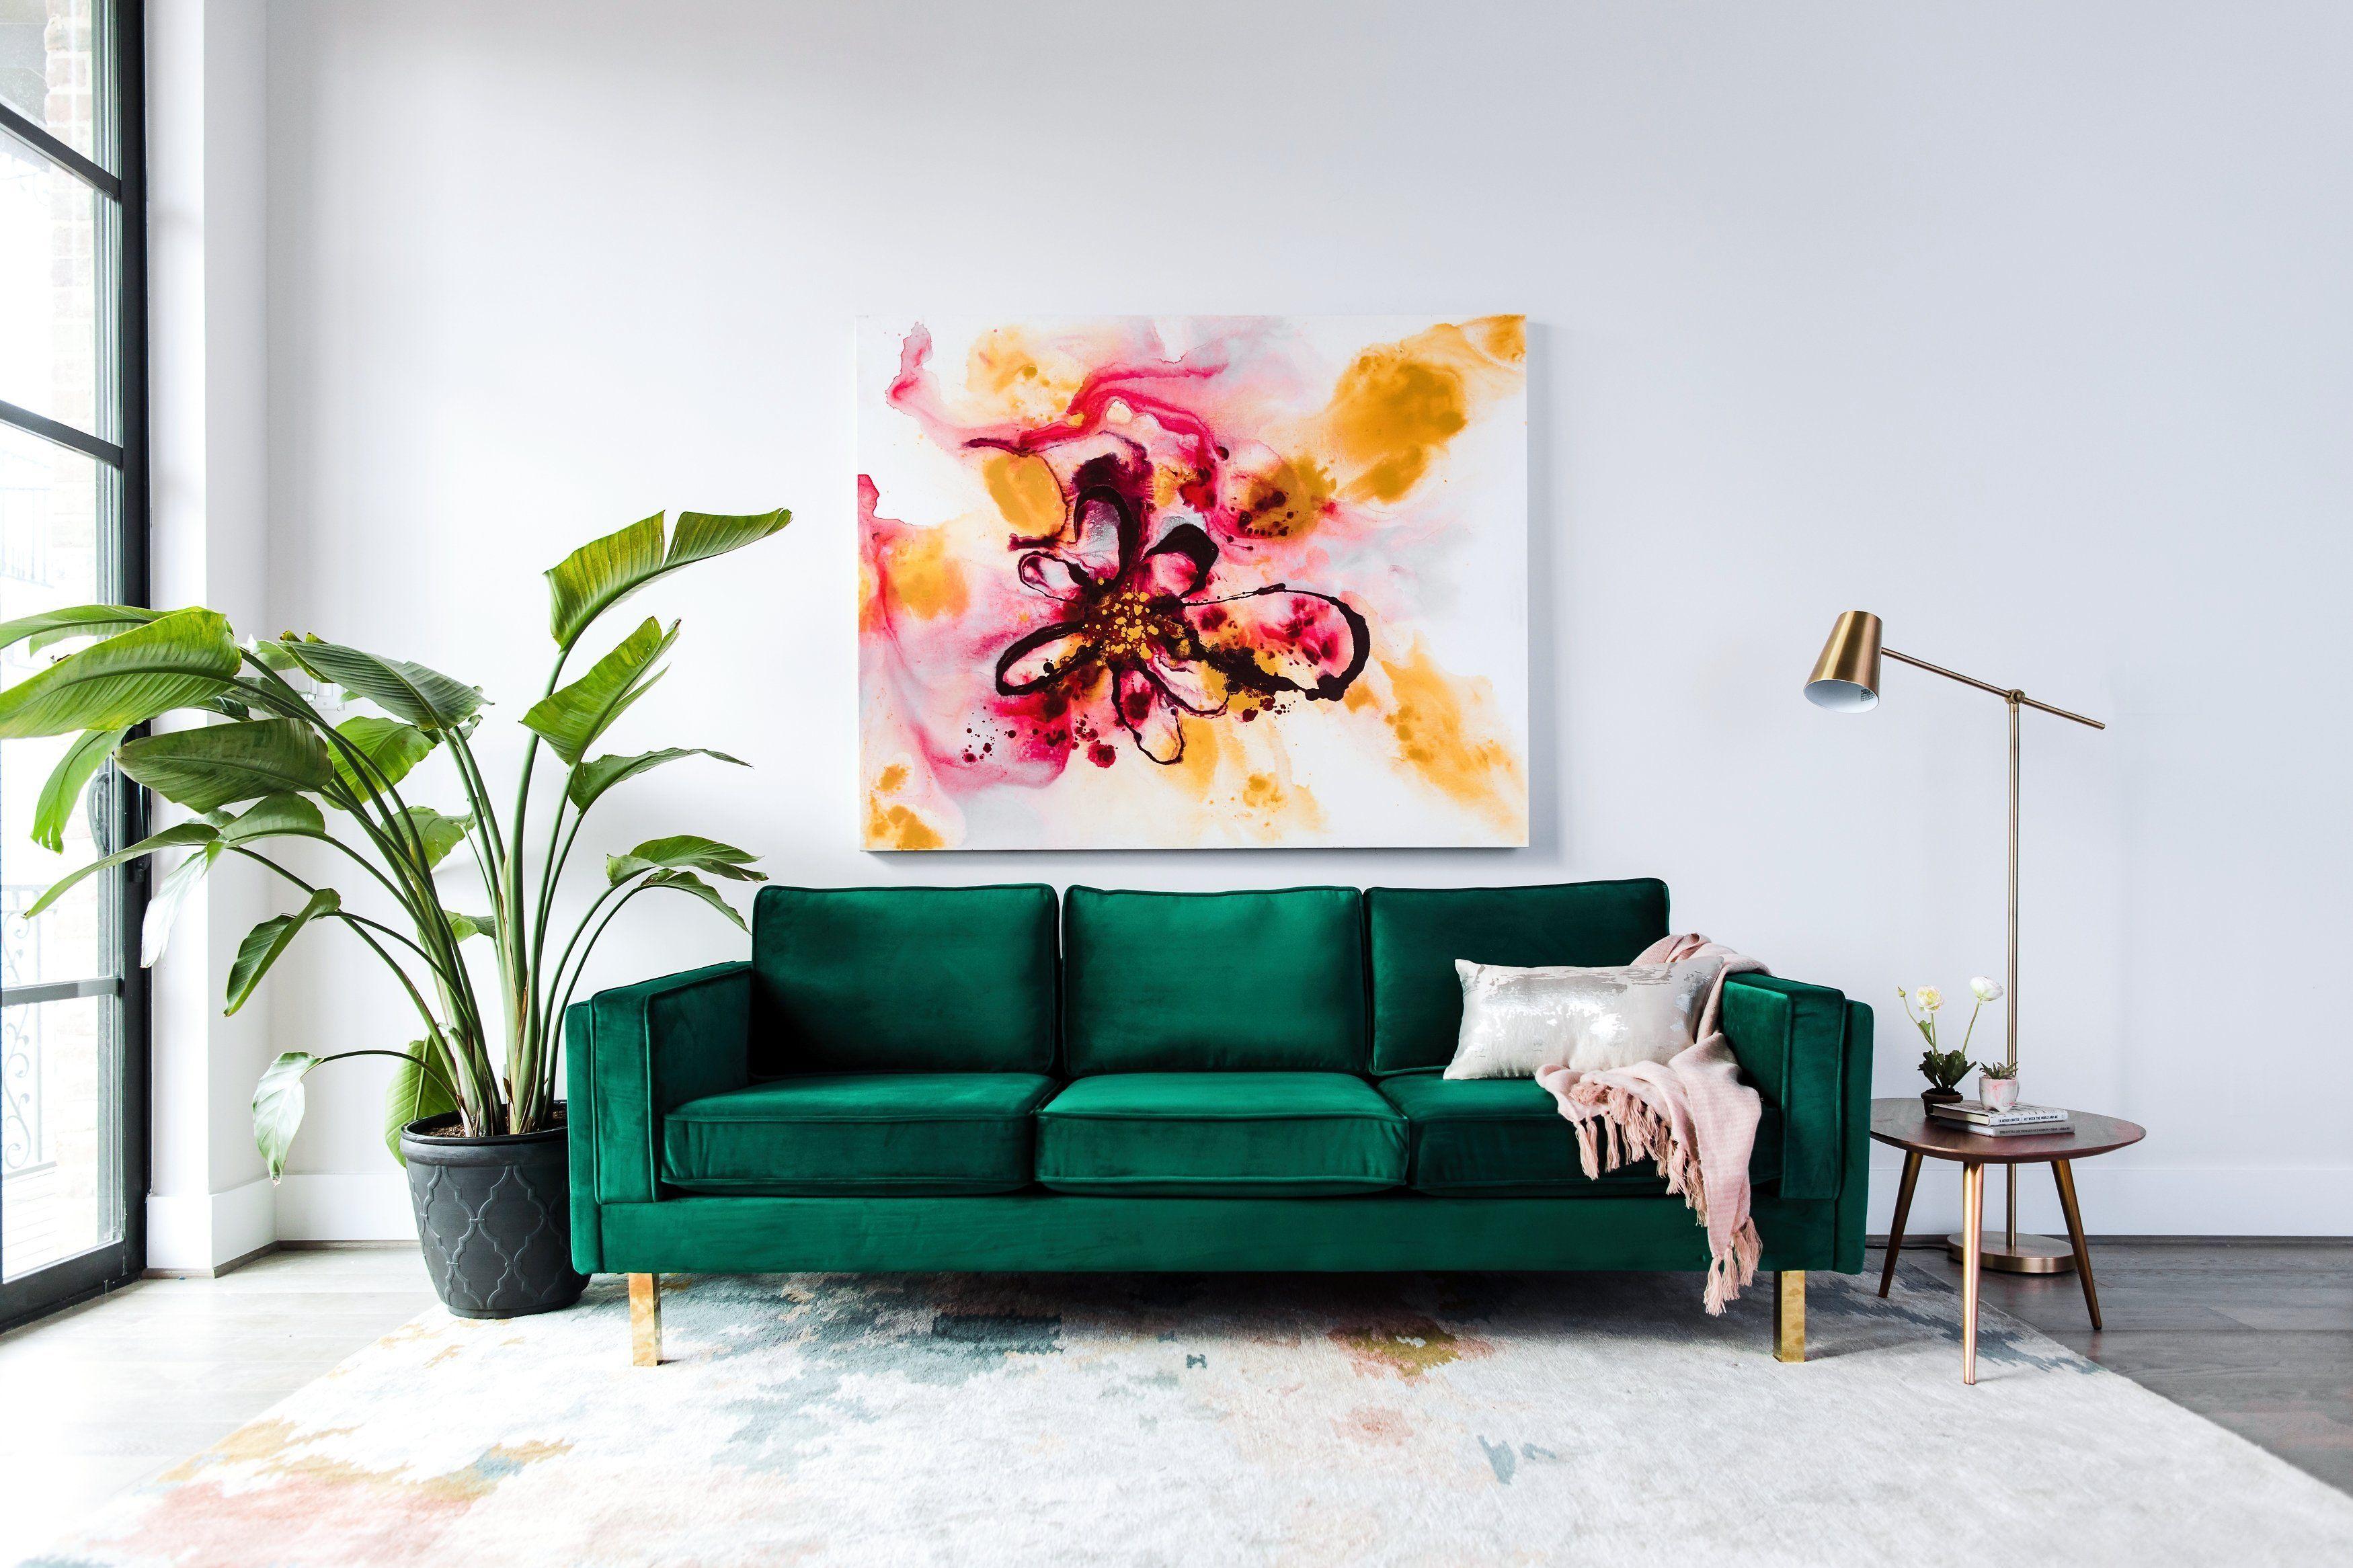 Peachy Lexington Velvet Sofa Green Edloe Finch Furniture Co Bralicious Painted Fabric Chair Ideas Braliciousco